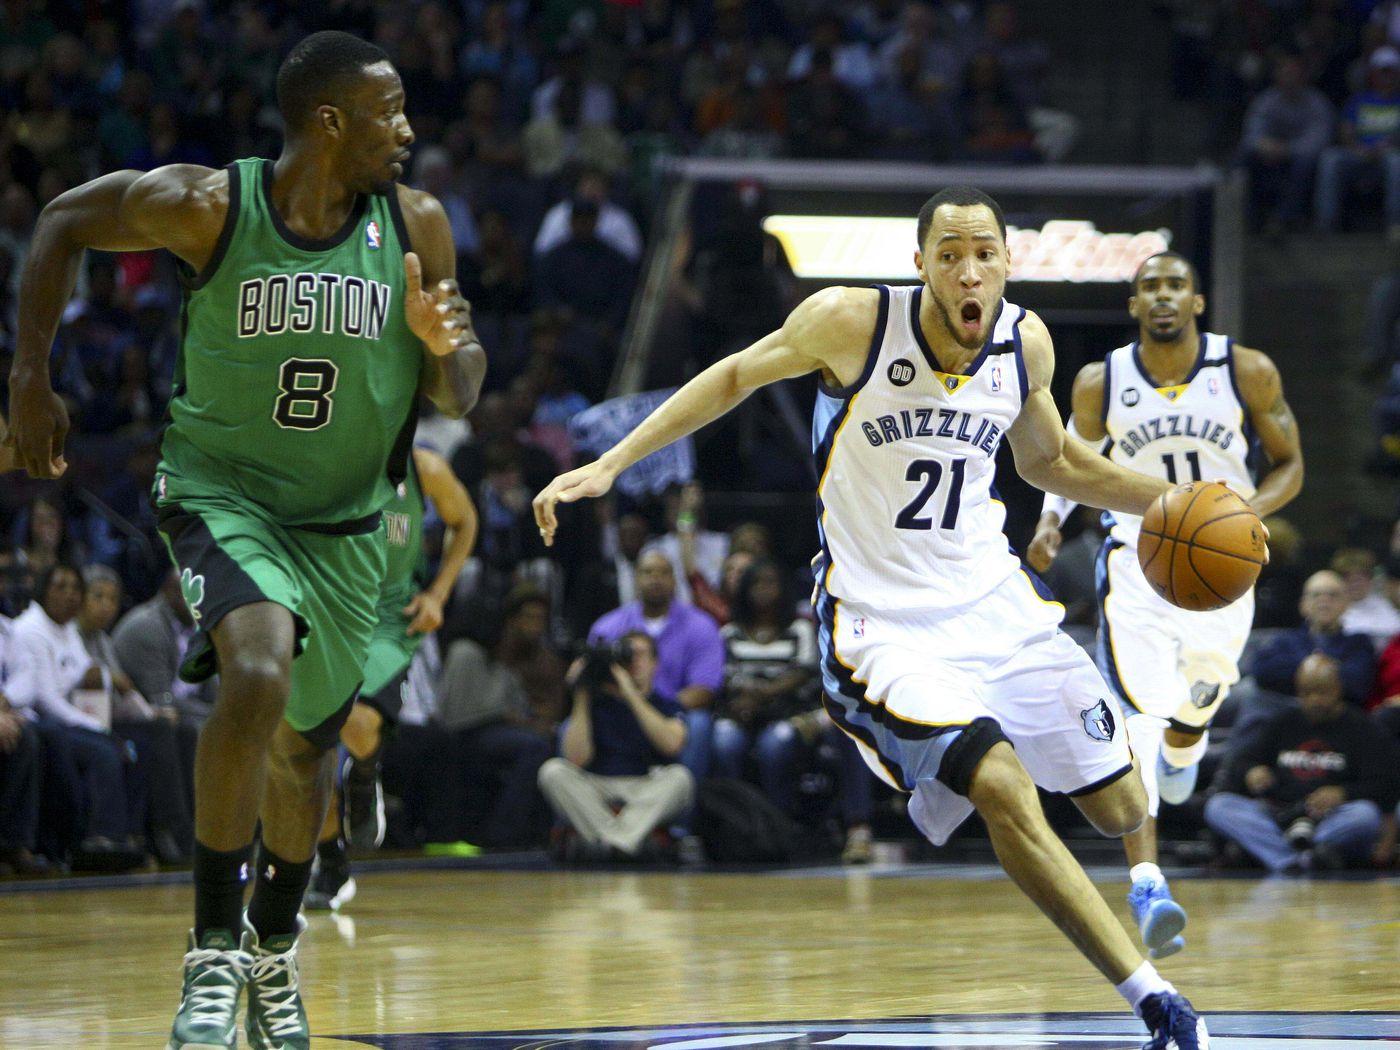 timeless design 2f692 84a9f Trade Imminent: Boston Celtics close to sending Jeff Green ...